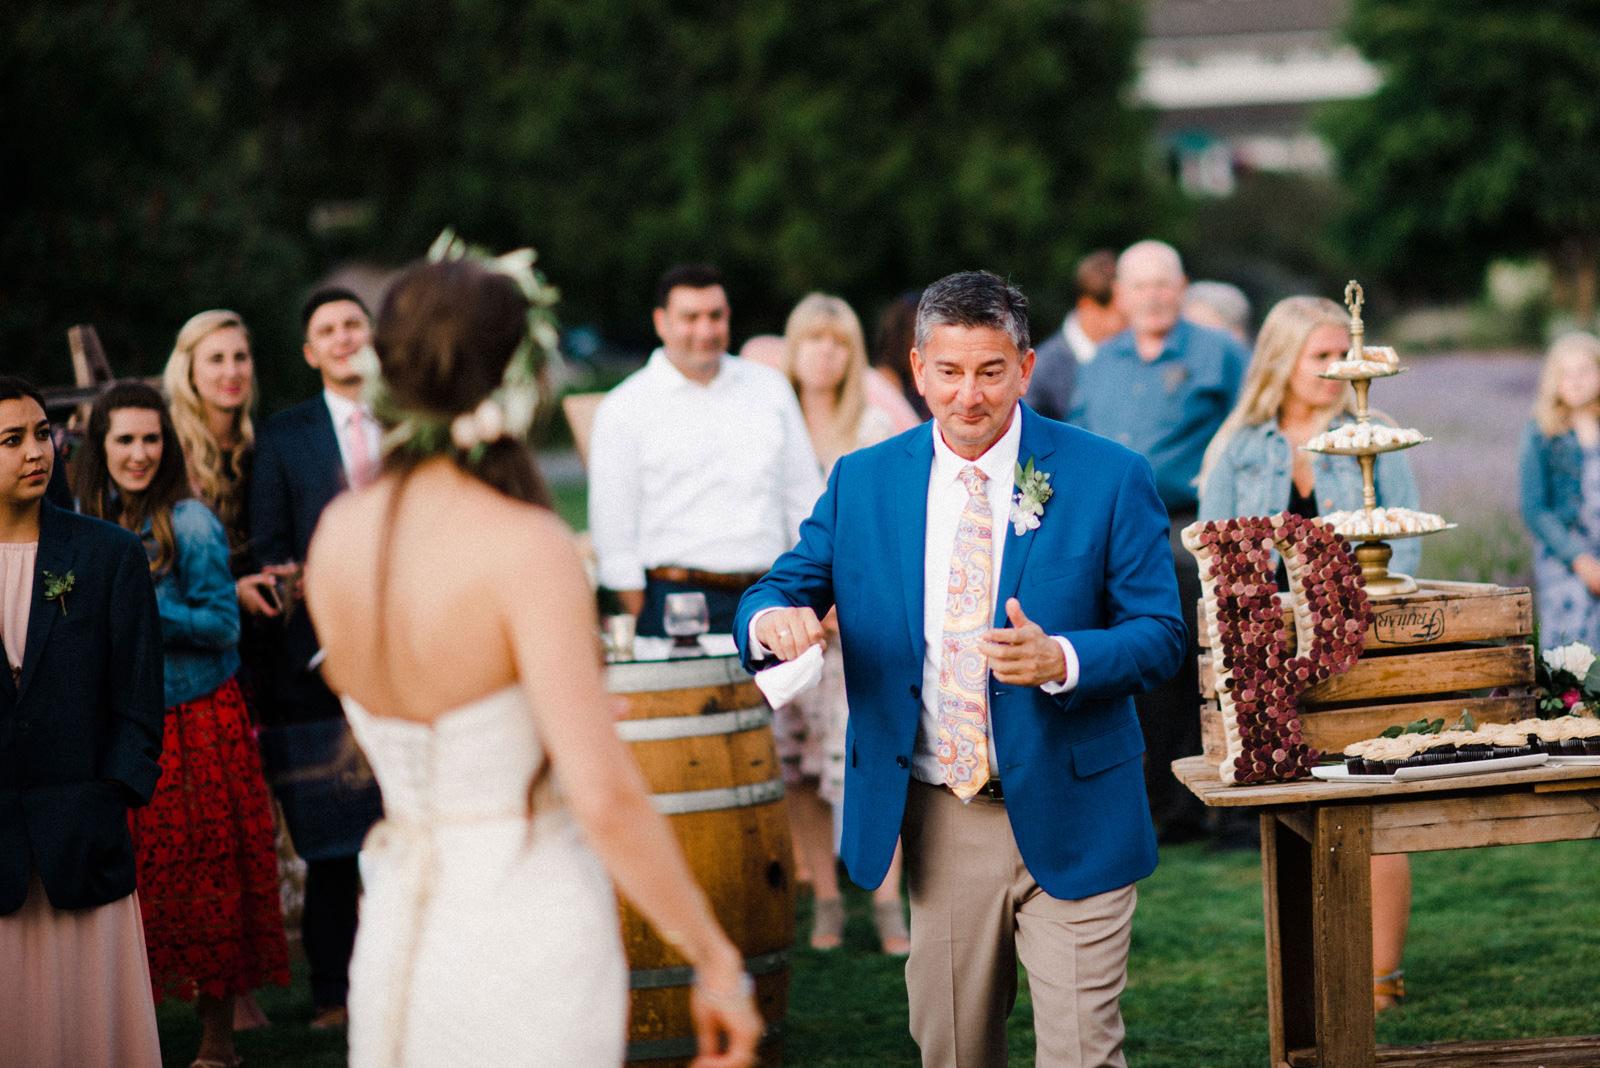 085-woodinville-lavendar-farm-wedding-with-golden-glowy-photos.jpg